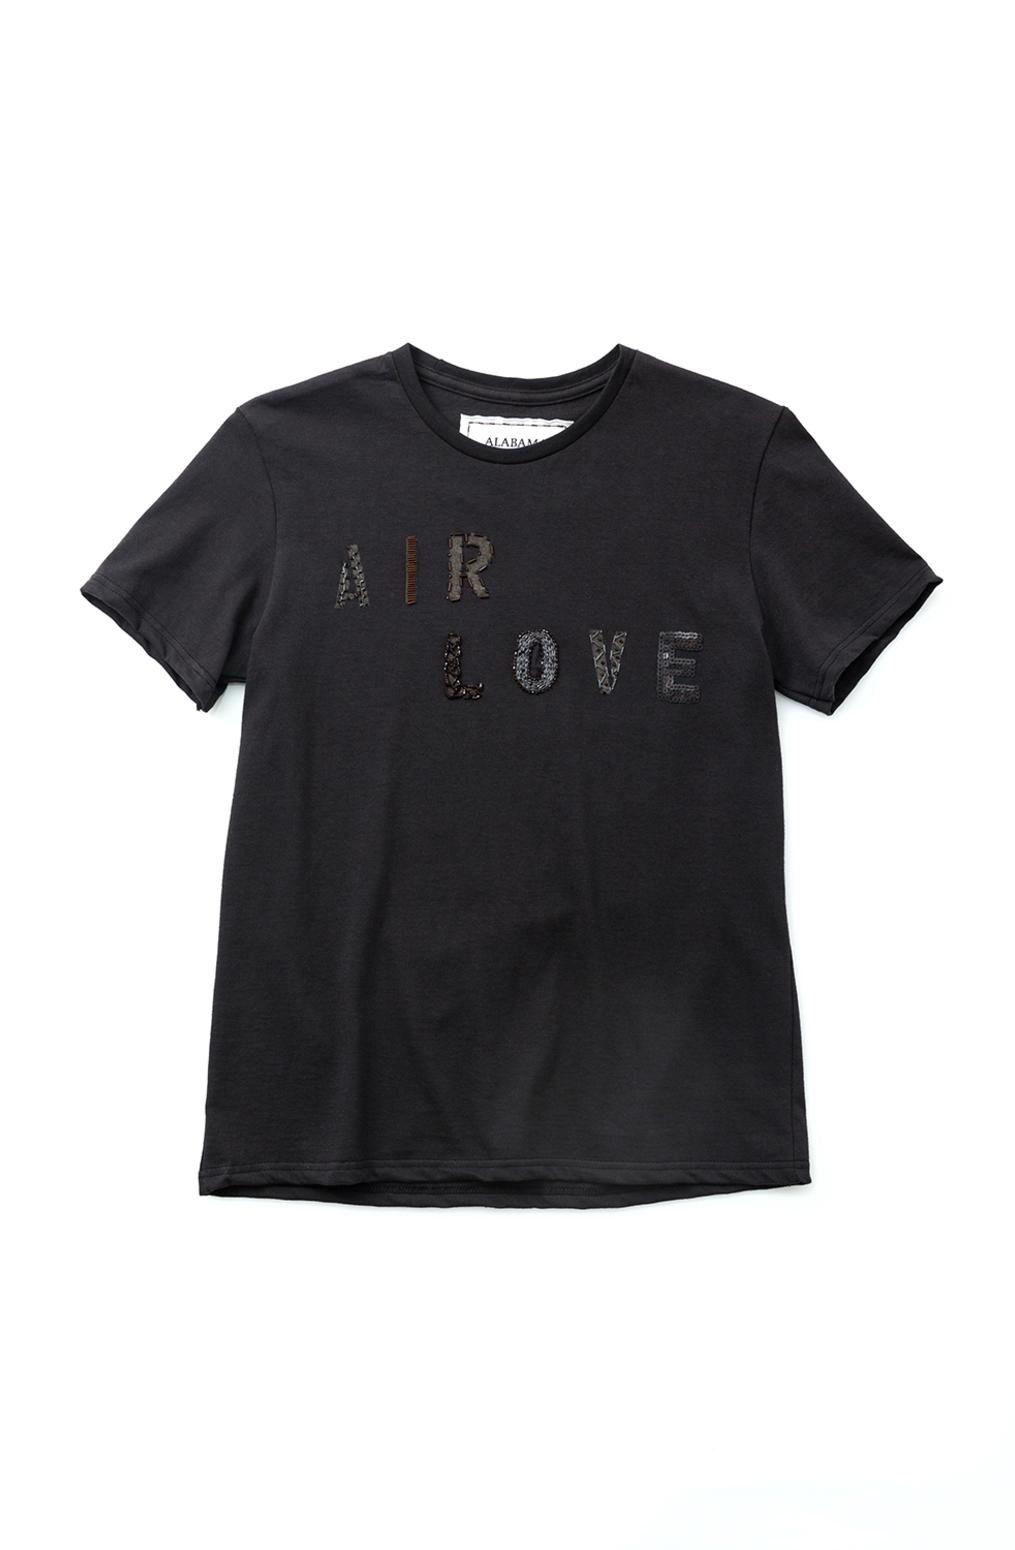 Alabama chanin hand embroidered beaded sequin air love tee 2